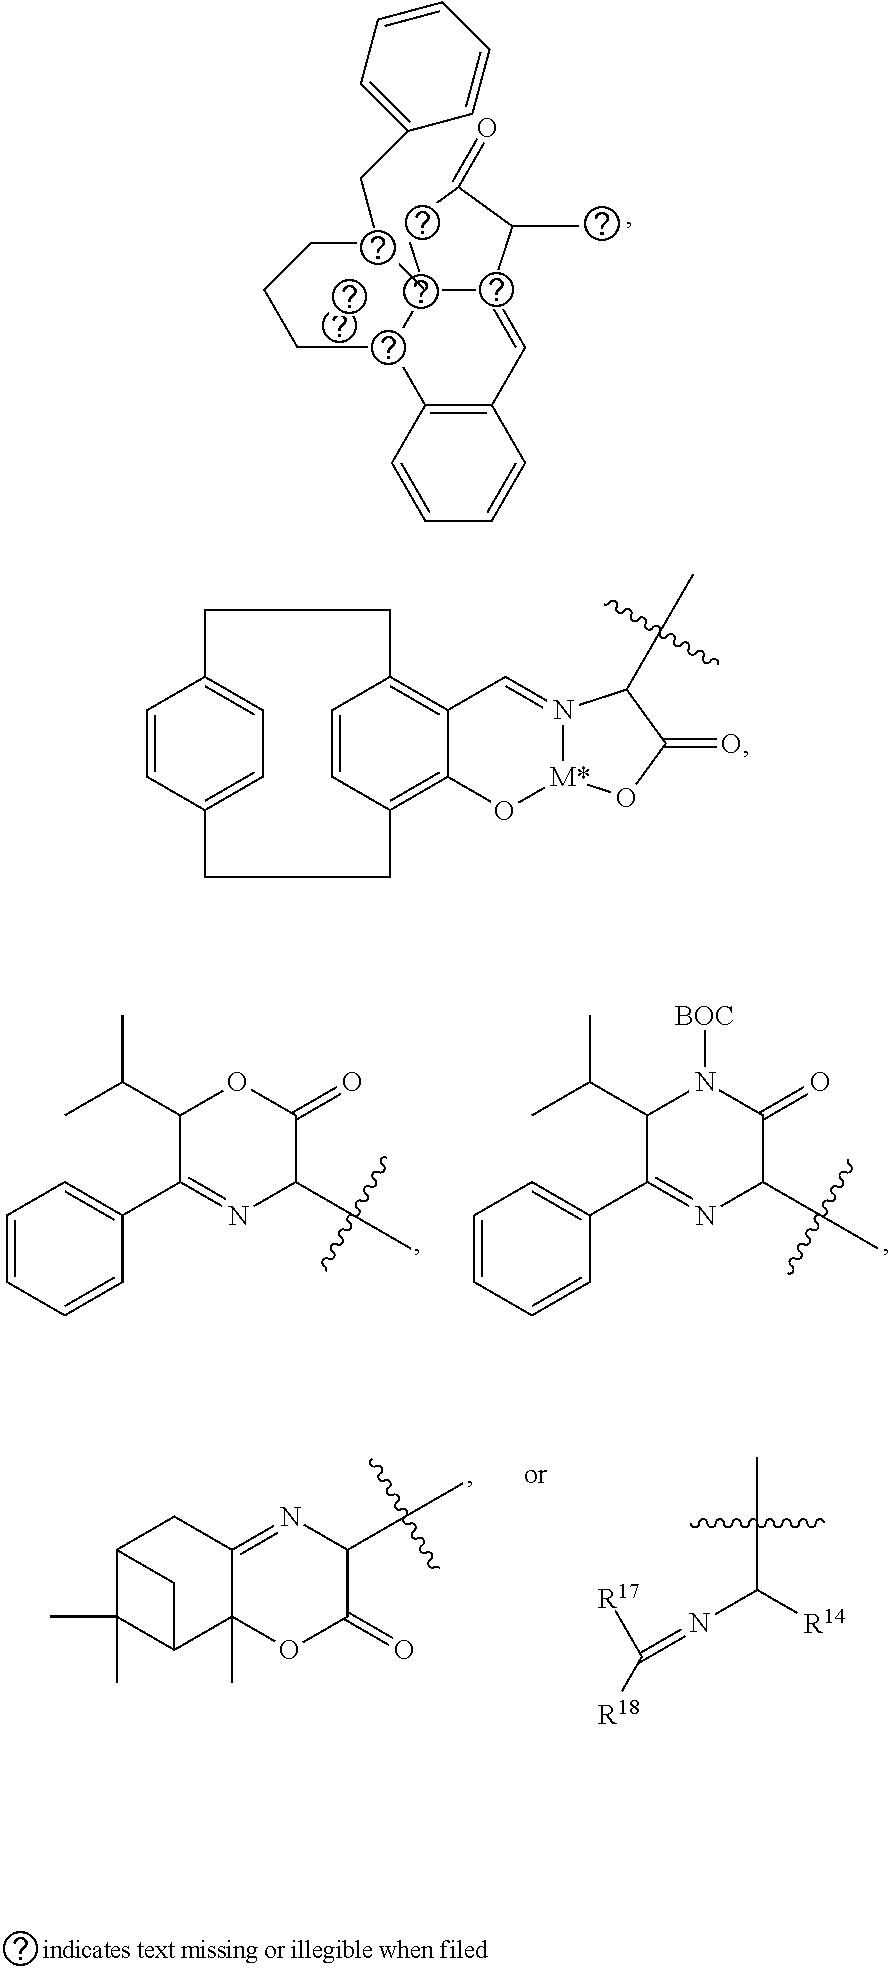 Us20140294763a1 Peptidomimetic Protease Inhibitors Google Patents Wiring Diagram Lowe 165 Fm Figure 20141002 C00028